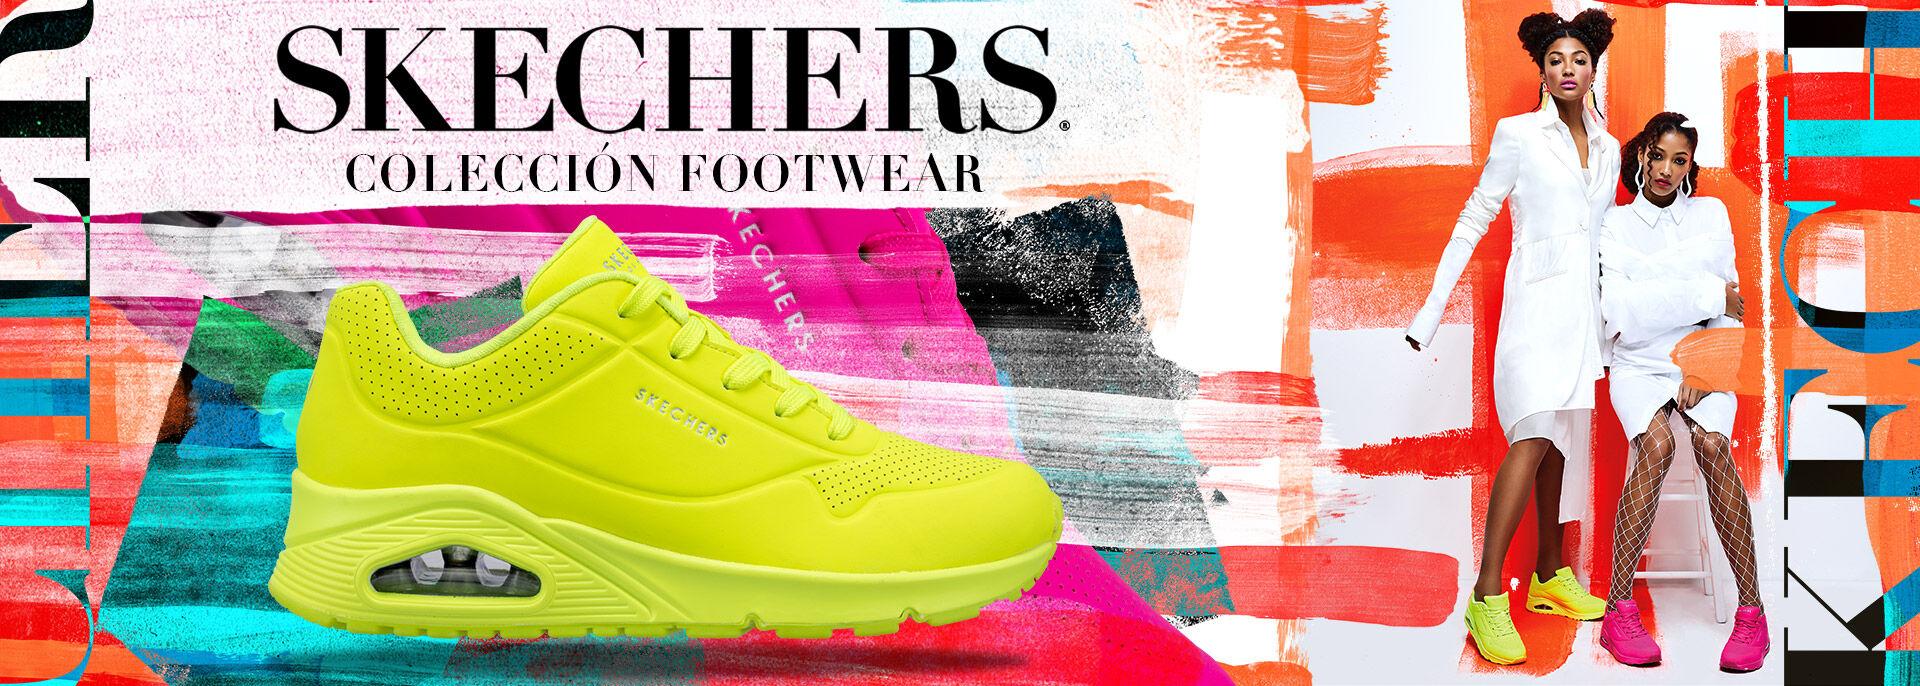 footwearagosto2020_calzadoskechers_920x686.jpg